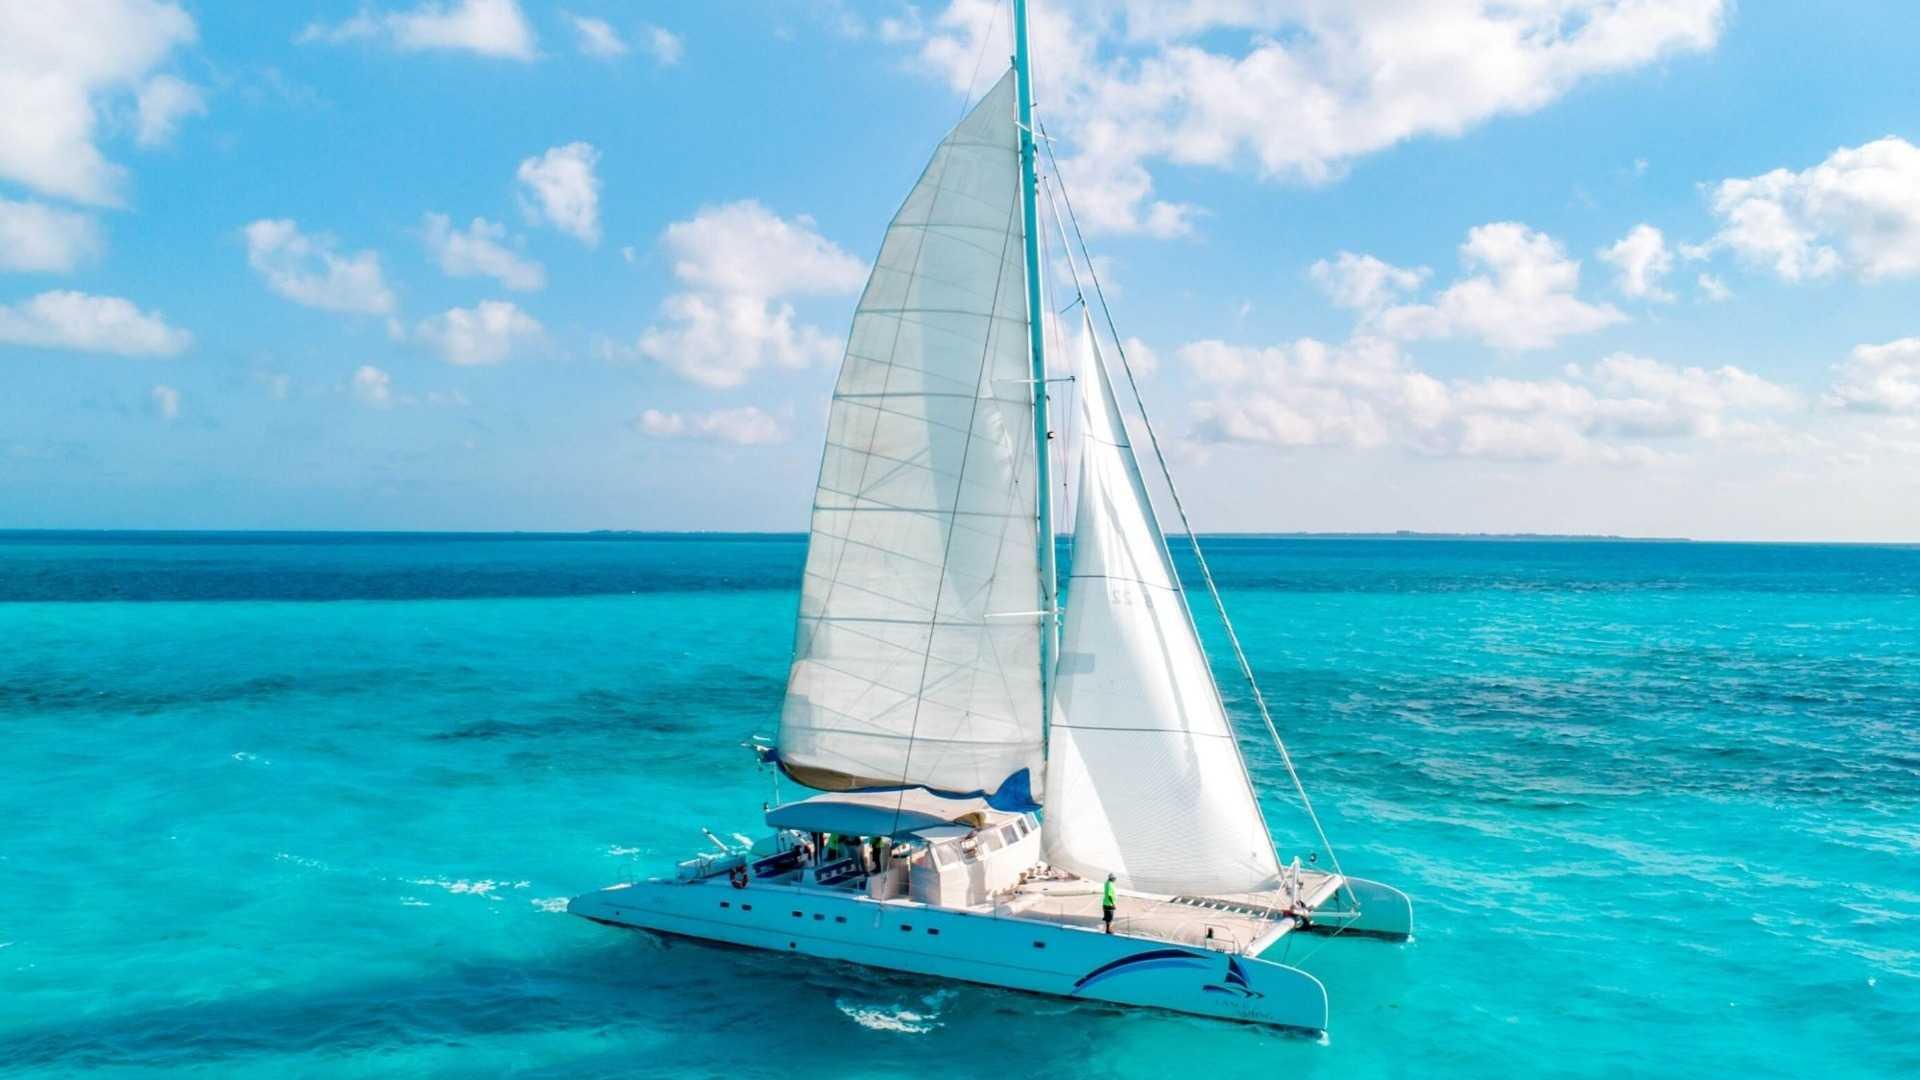 5 - LowRes - Sea Passion III - Isla Mujeres Catamaran Tour - Cancun Sailing